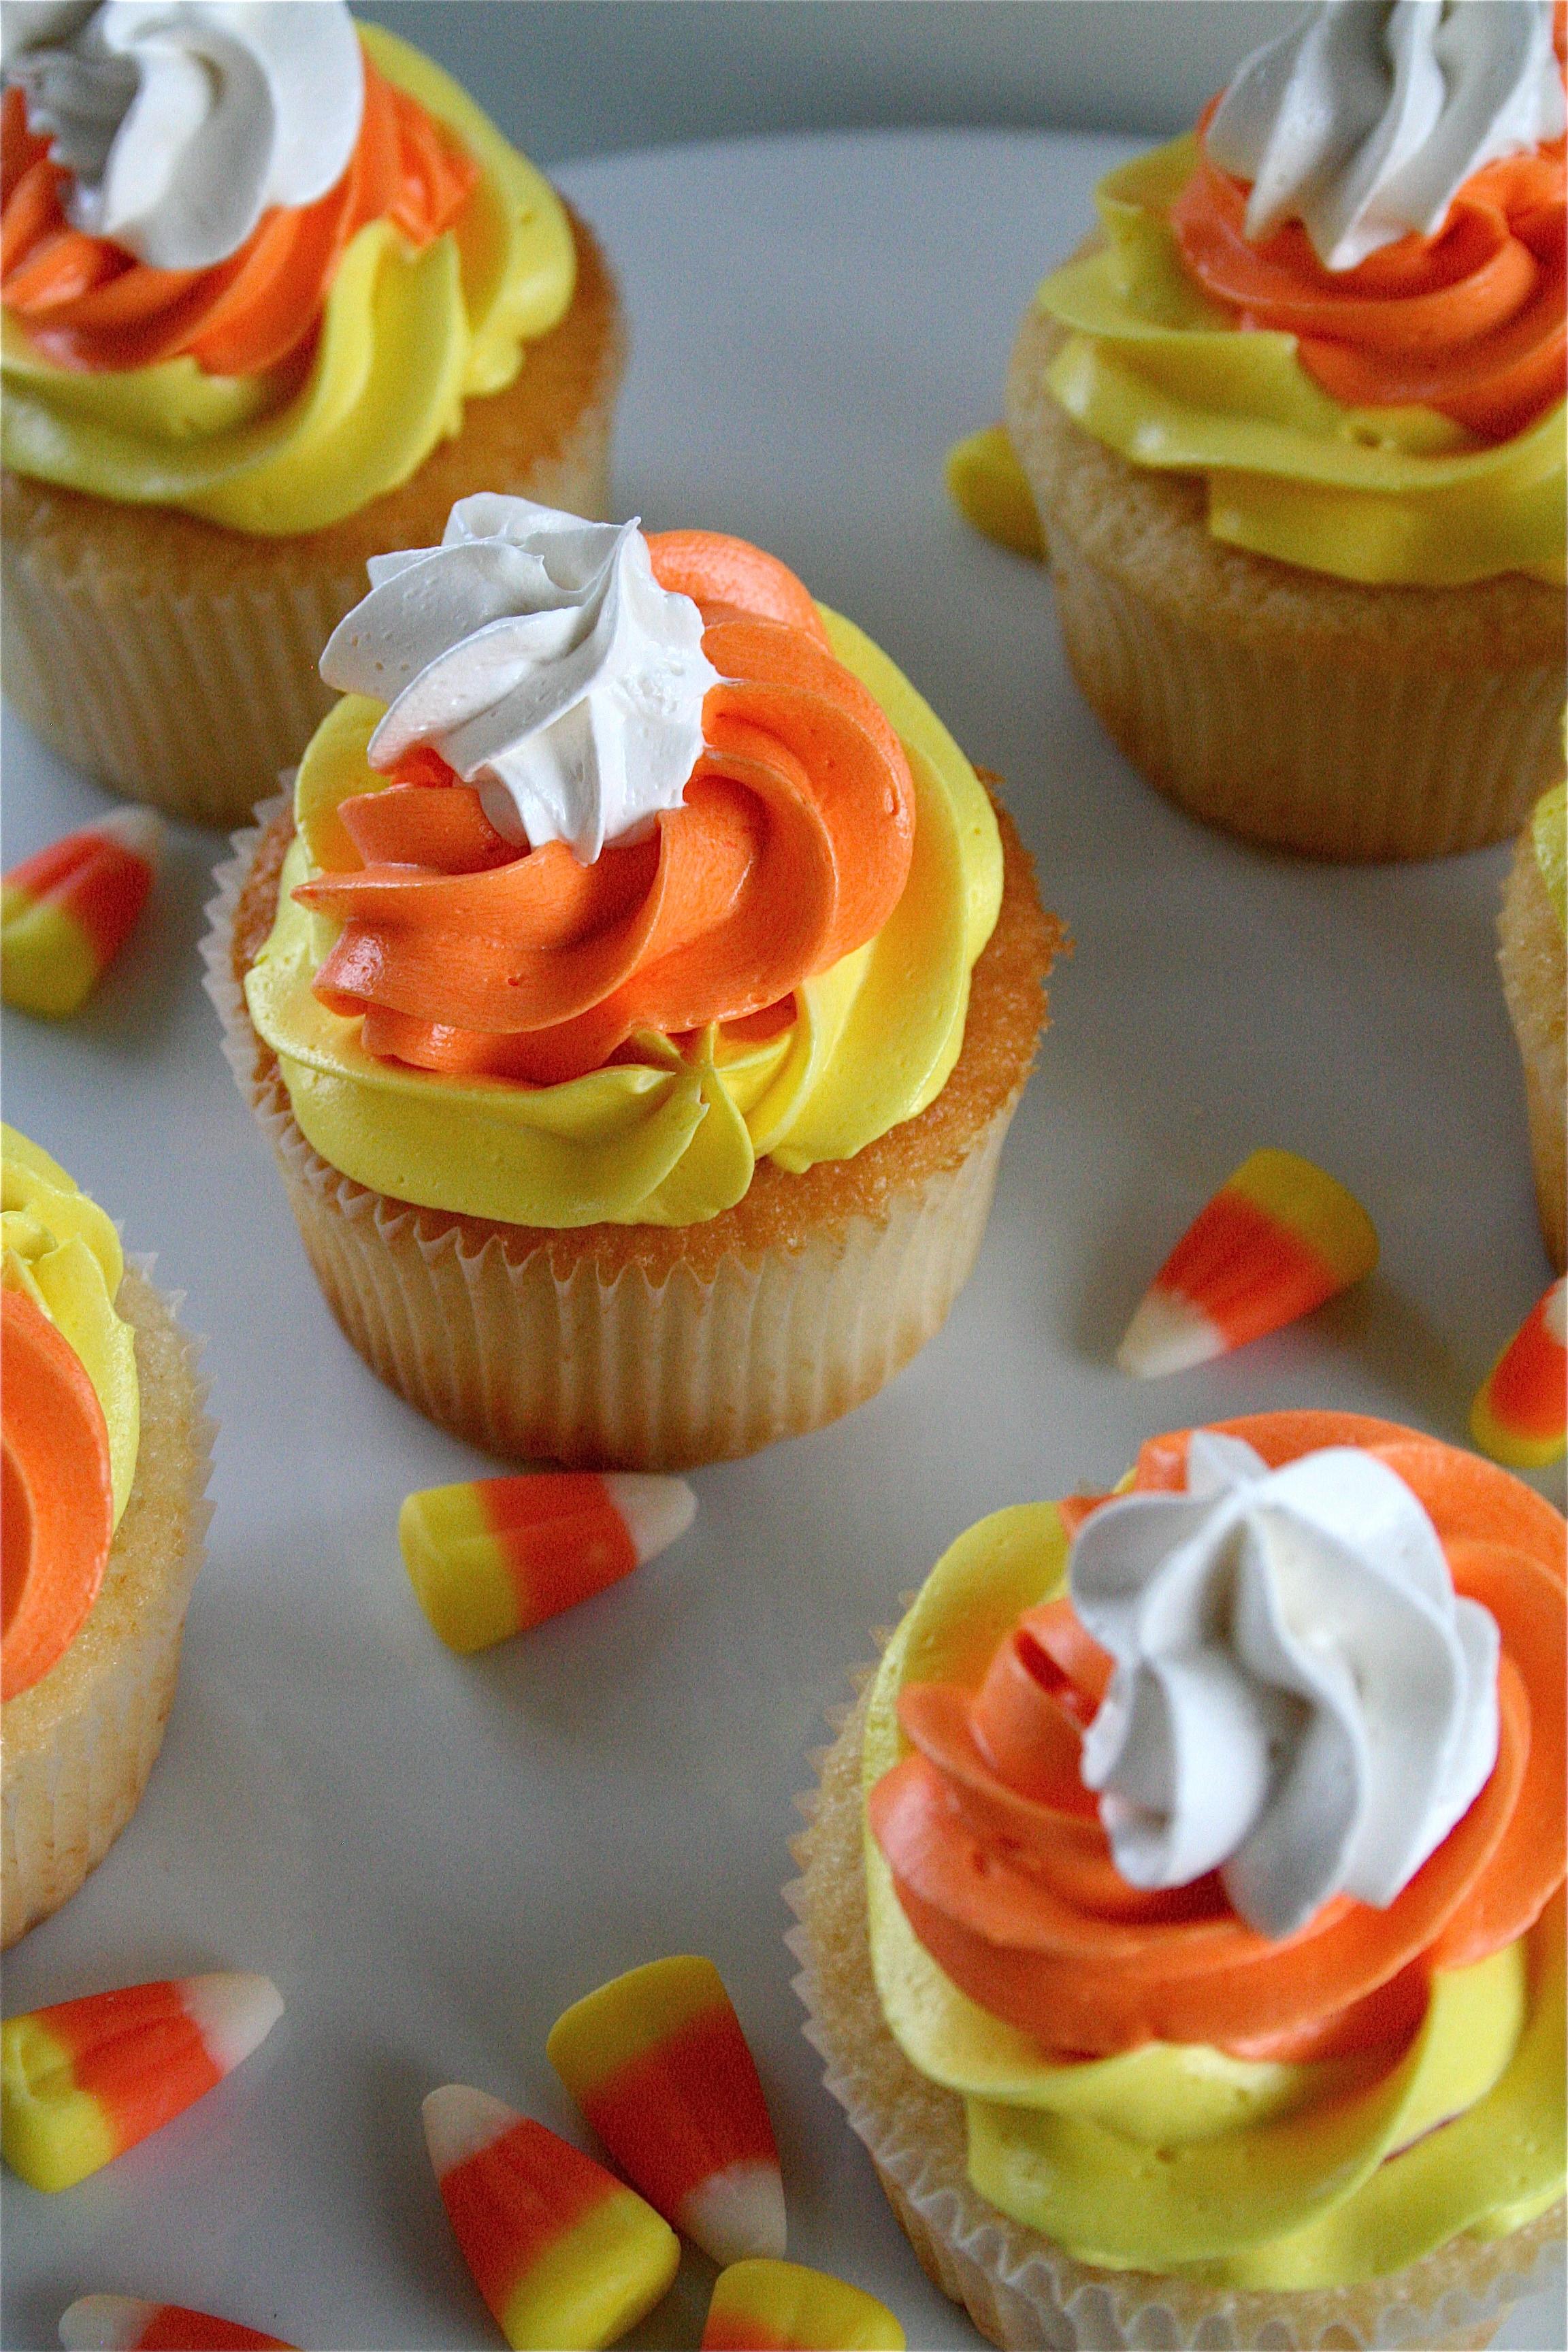 Halloween Cupcakes Ideas  28 Cute Halloween Cupcakes Easy Recipes for Halloween